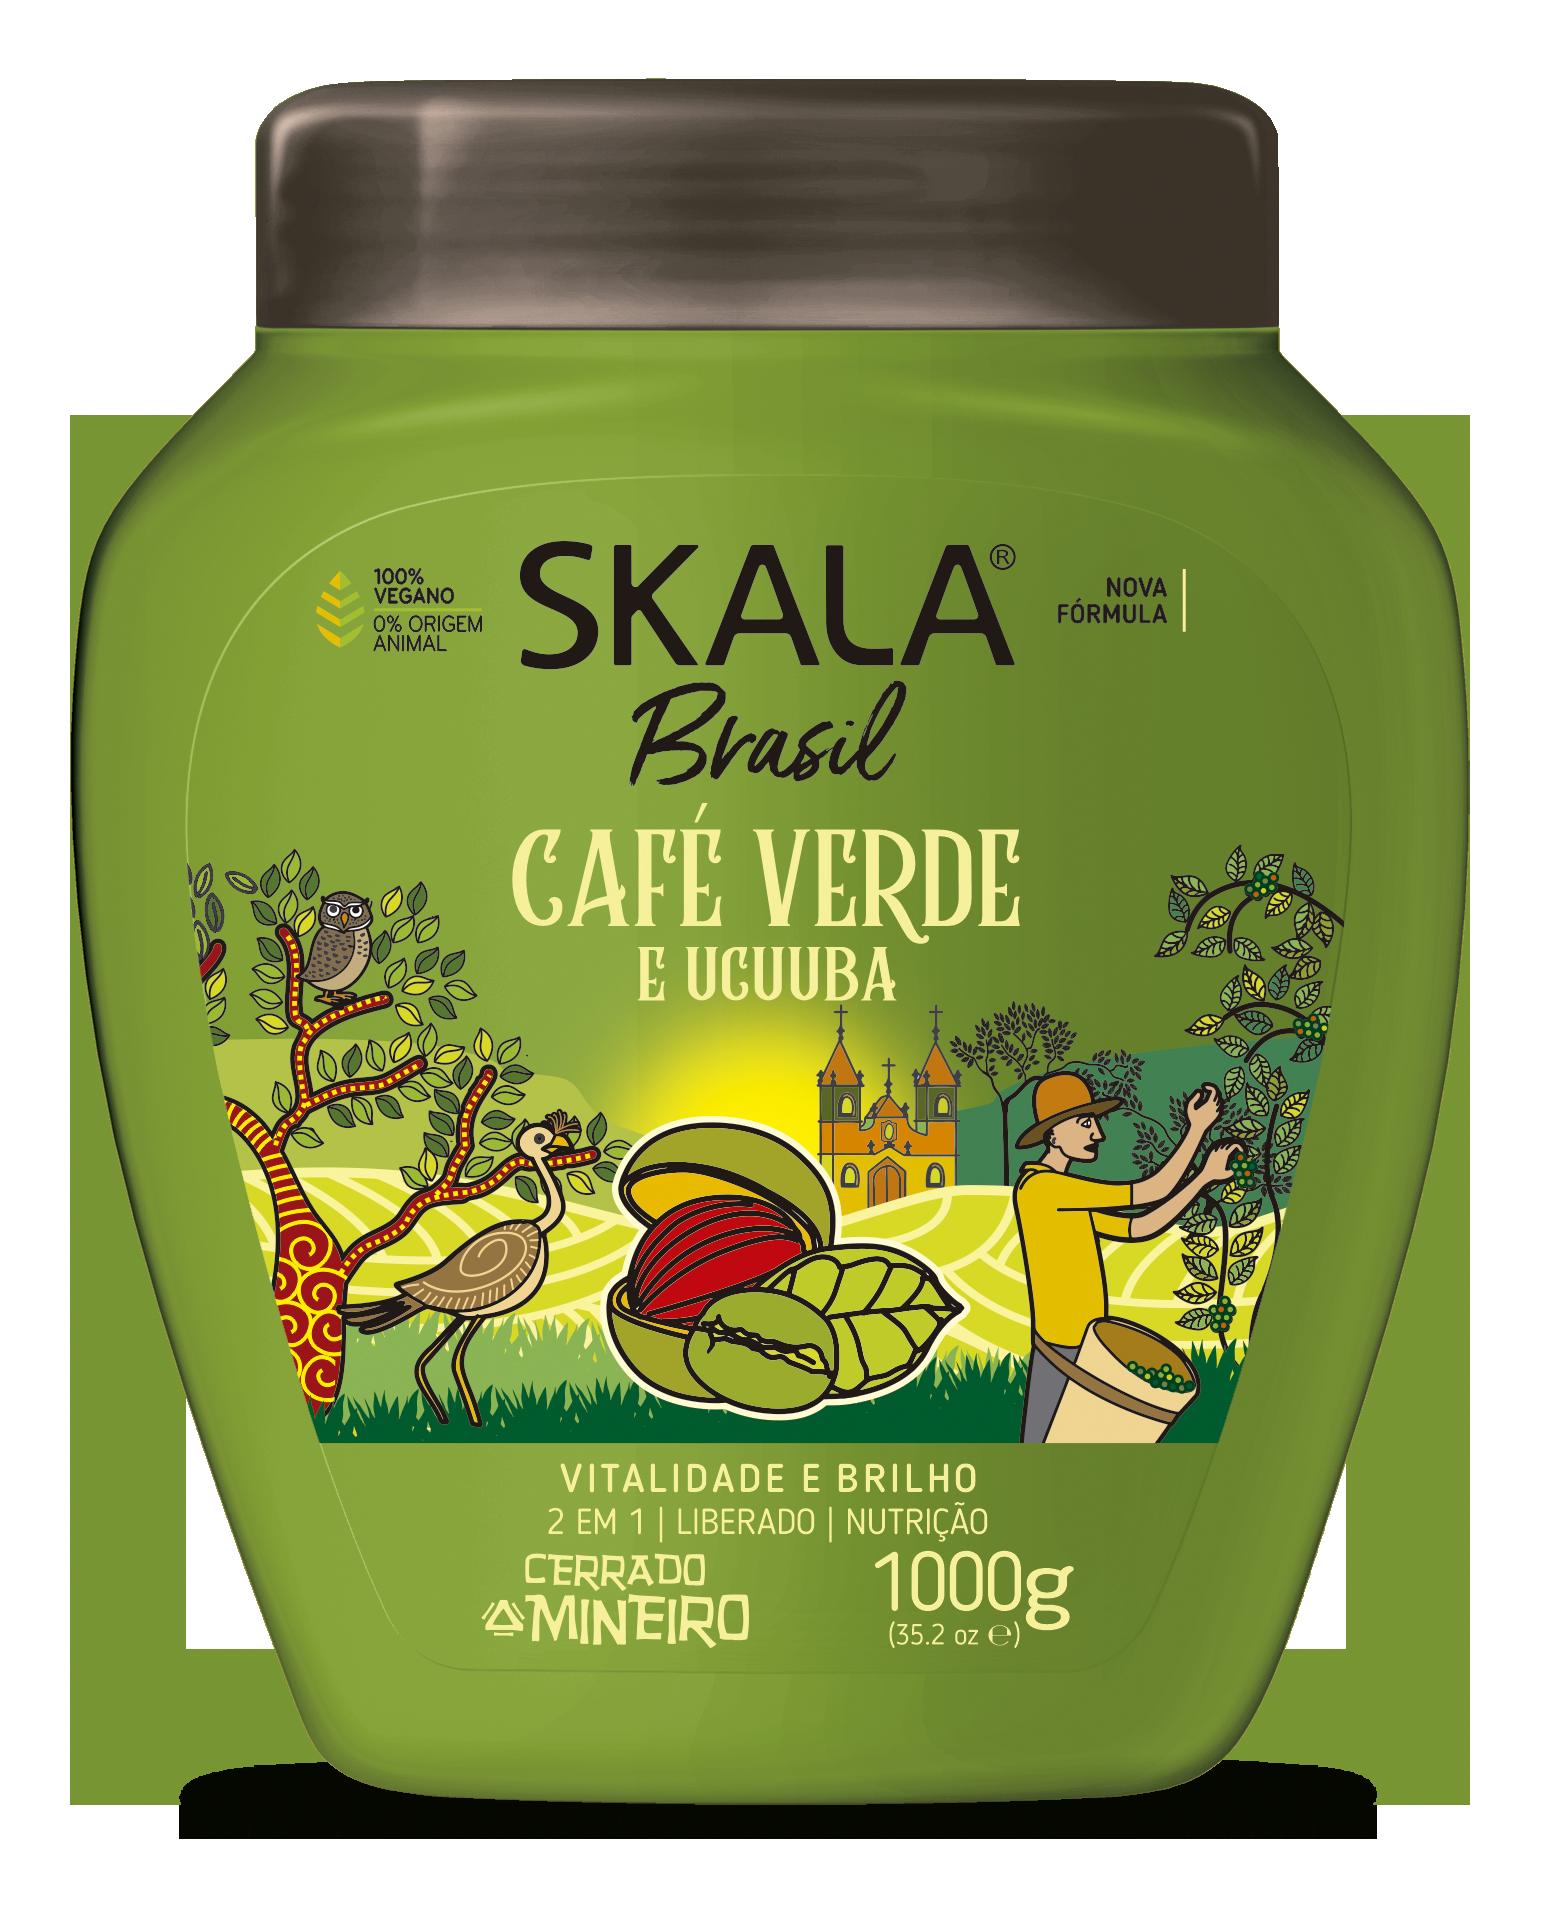 Café Verde e Ucuuba